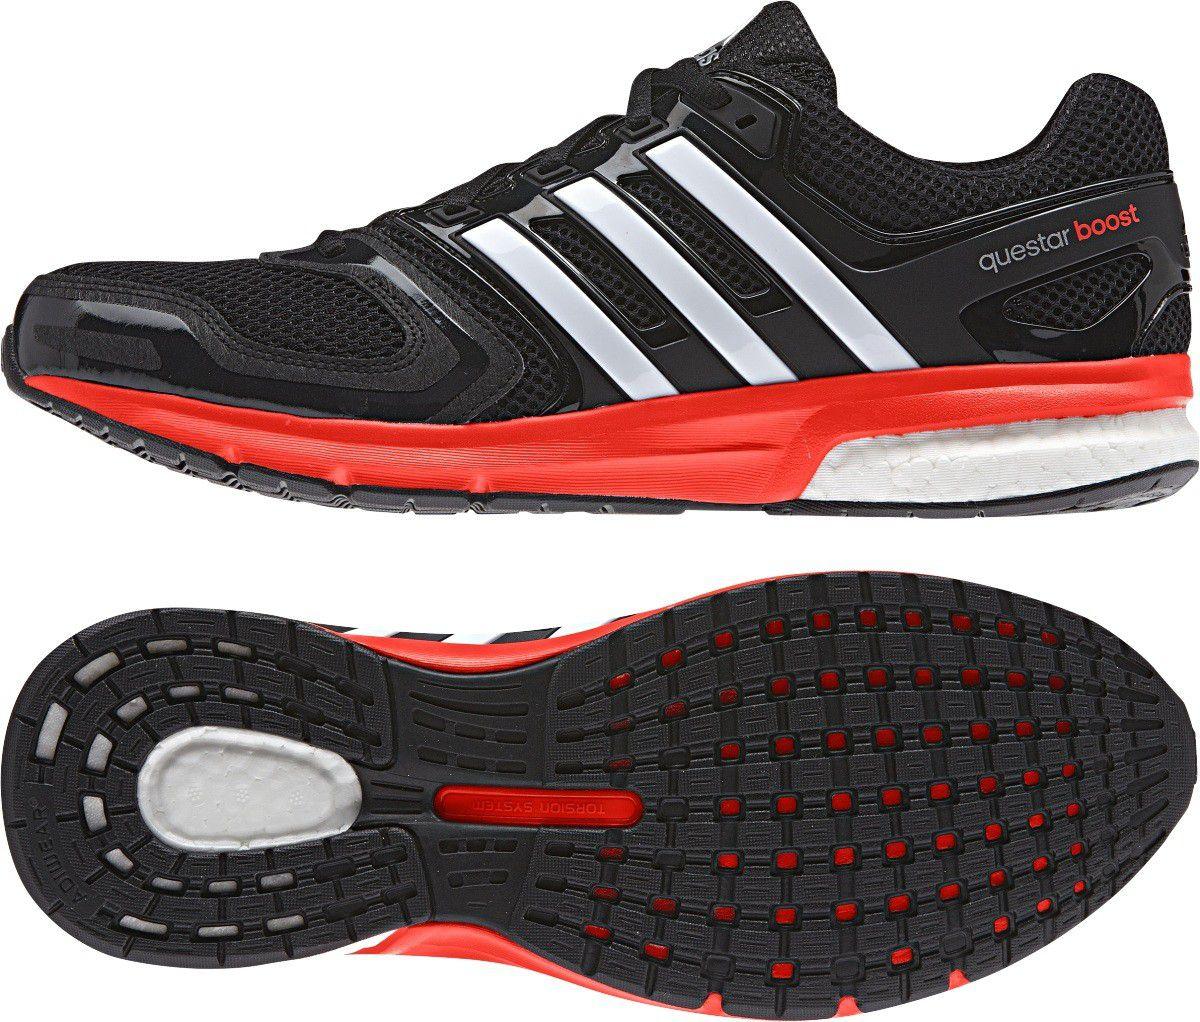 adidas anti pronation shoes - Helvetiq